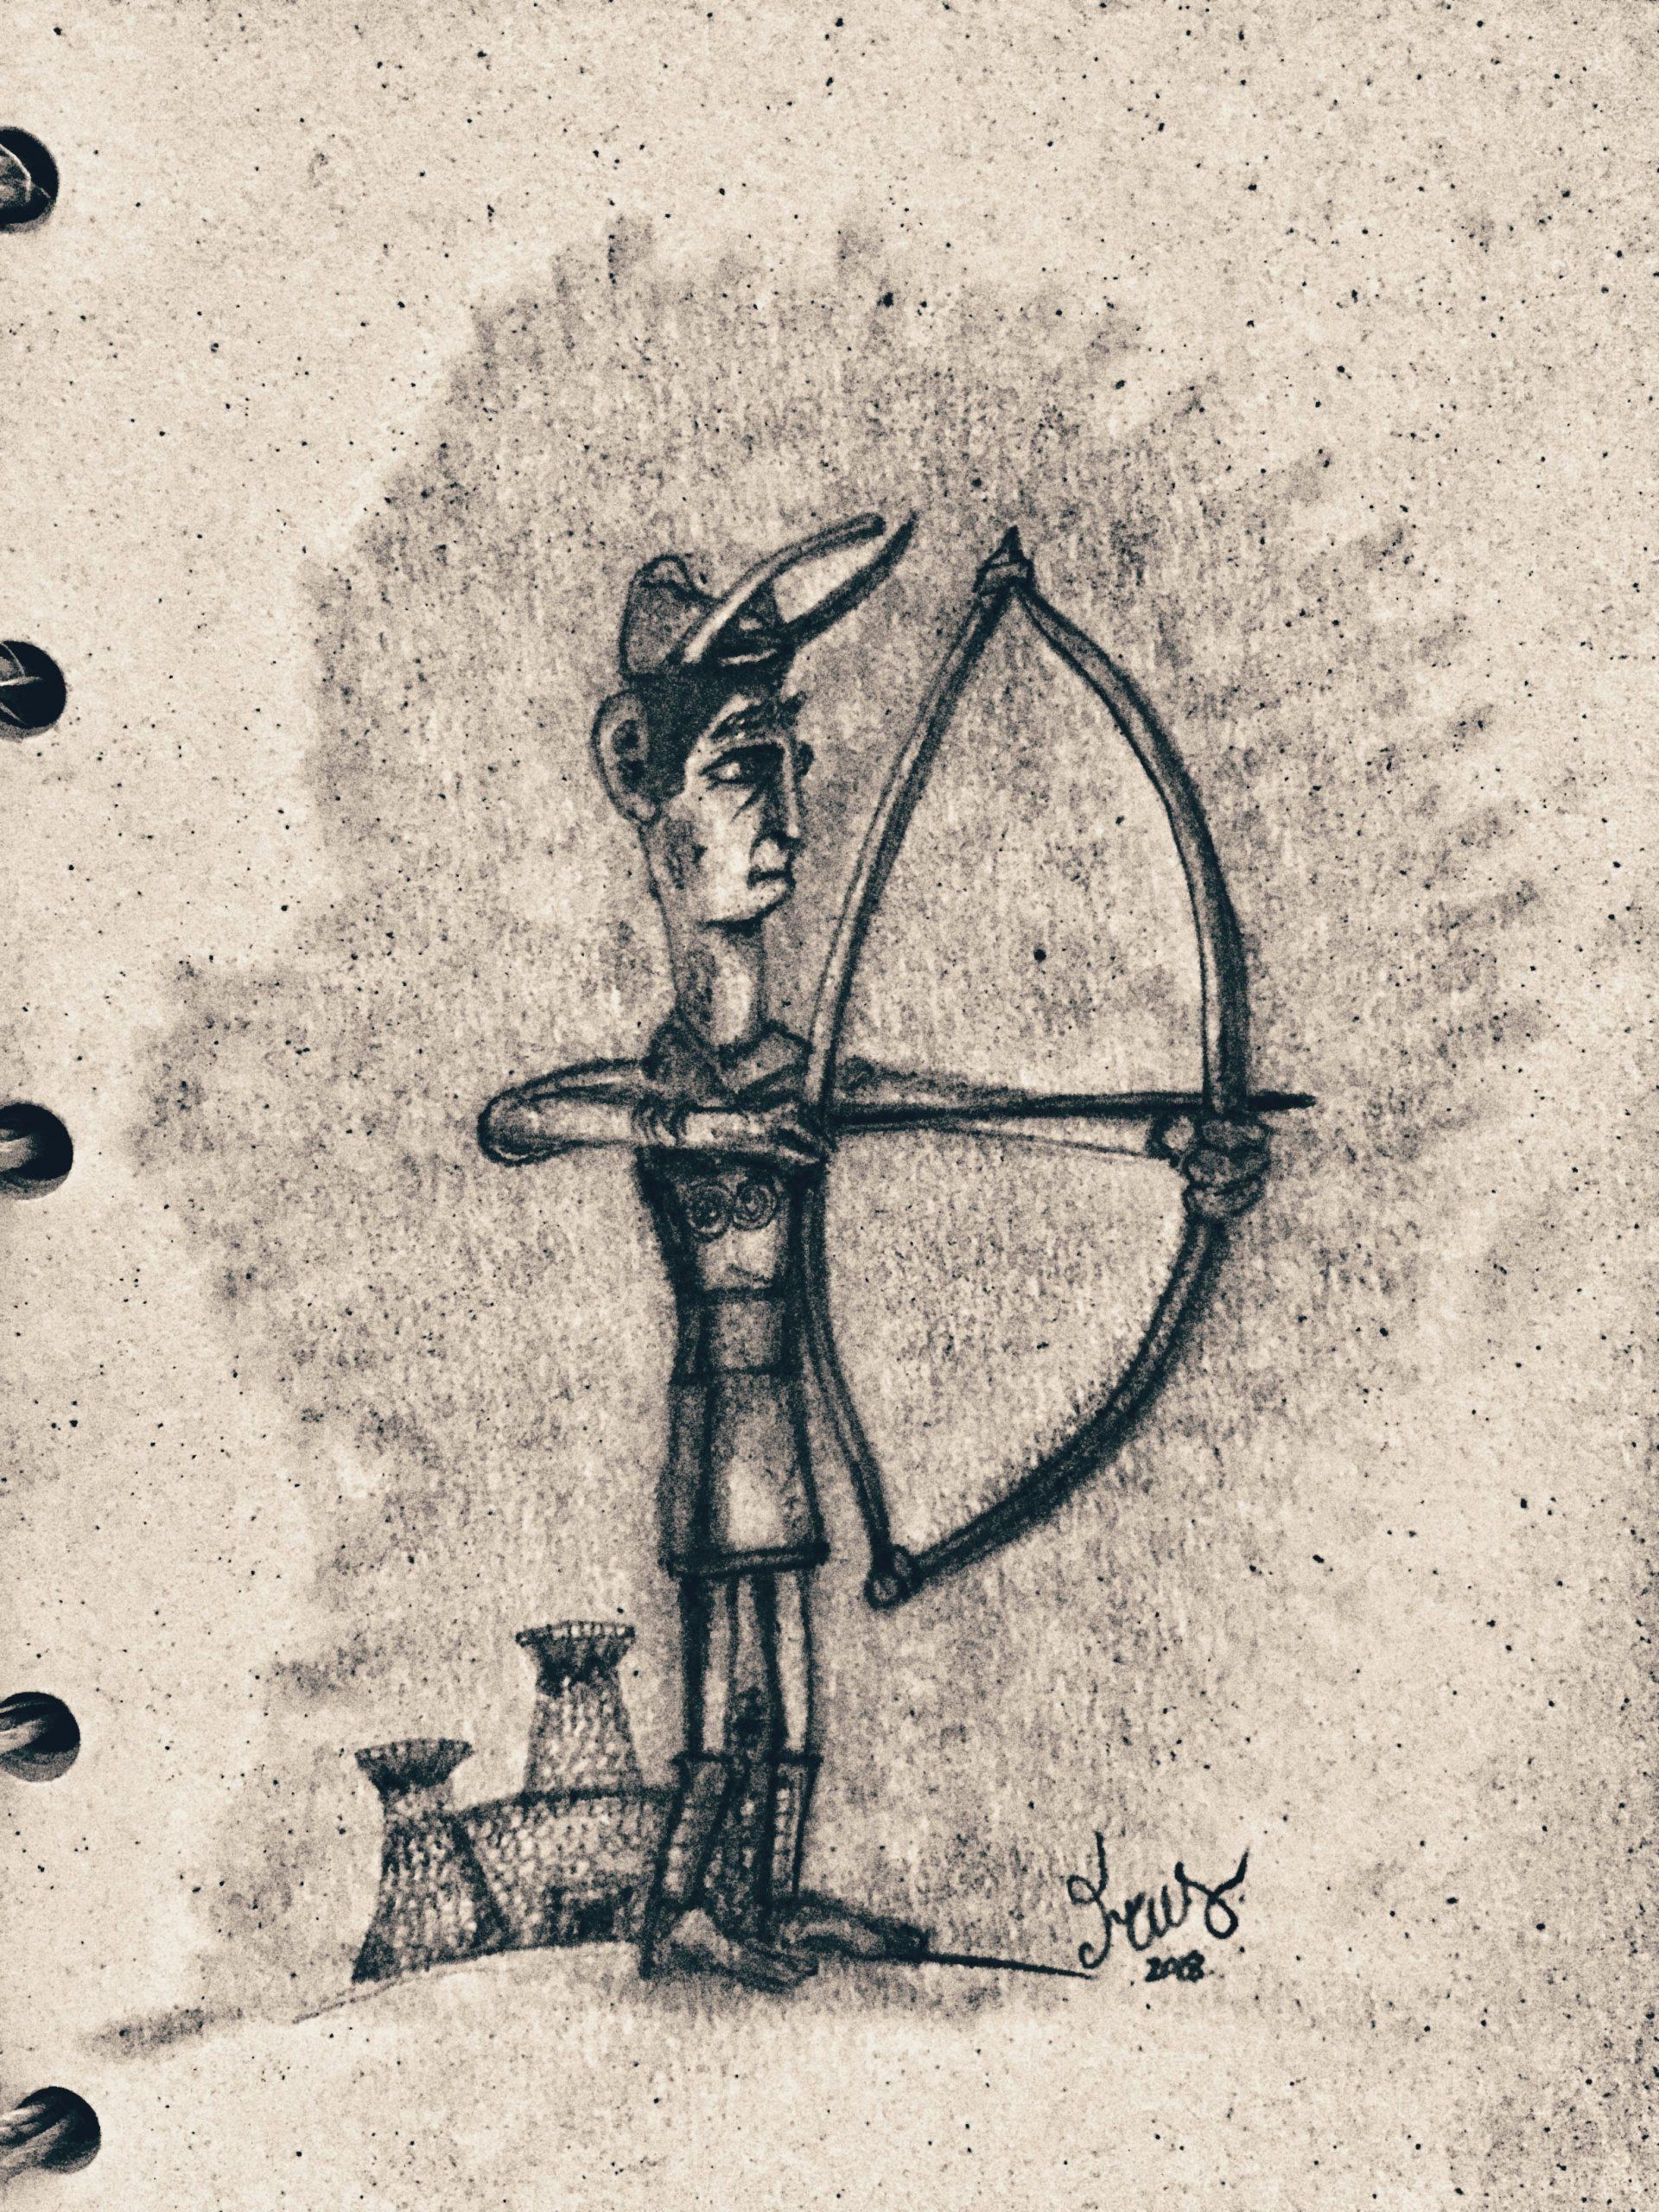 Shardara archer